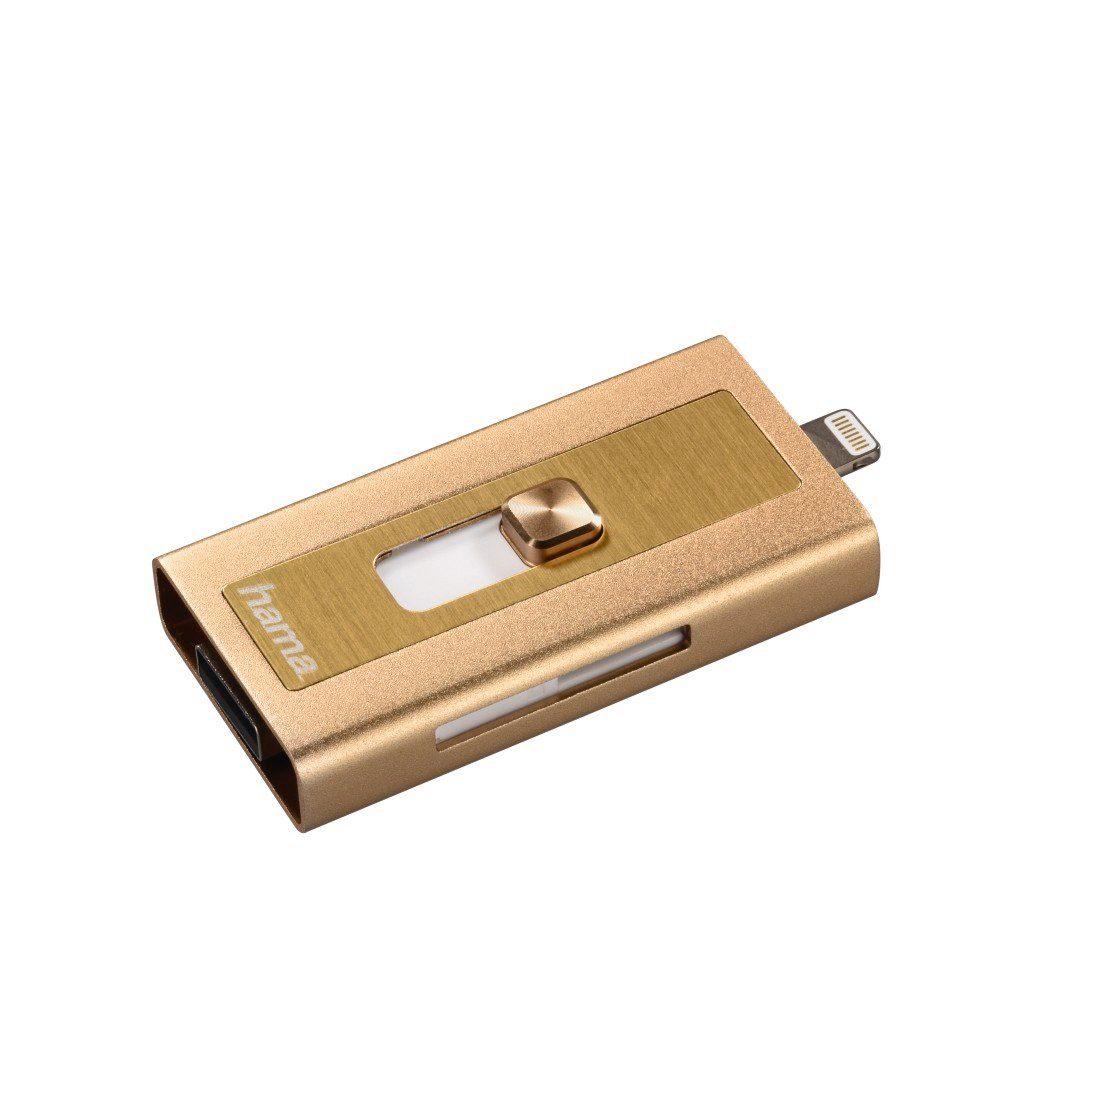 Hama microSD Kartenleser mit USB und Lighting Anschluss MoveData »für Apple iPhone, iPad, iPod«